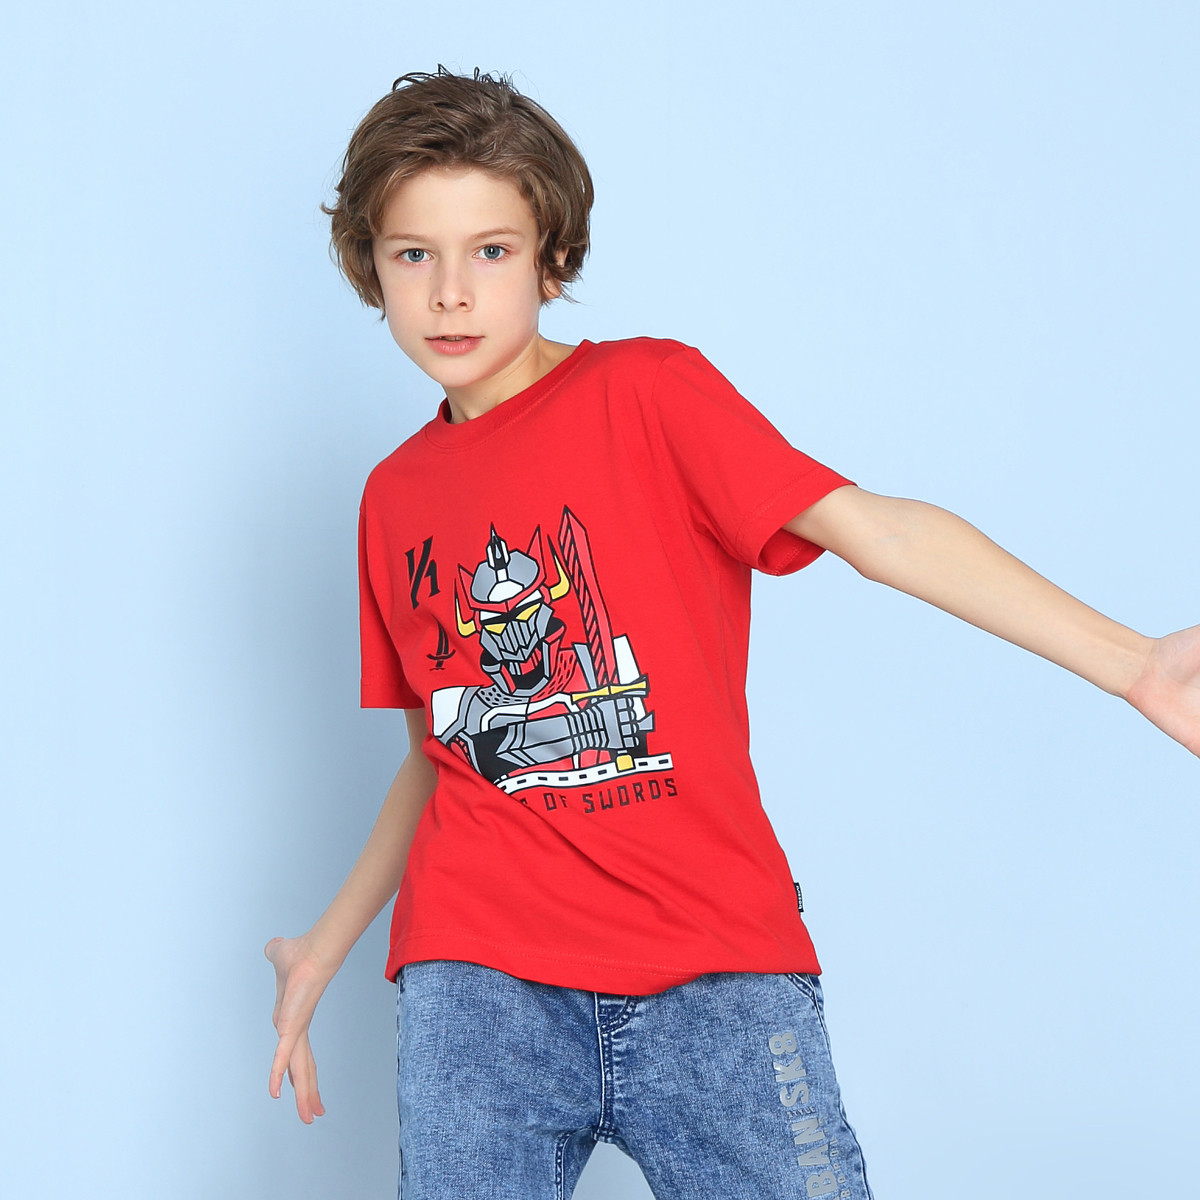 bossini kids堡狮龙童装19春装新款男童剑客印花宝宝短袖儿童t恤43080301025